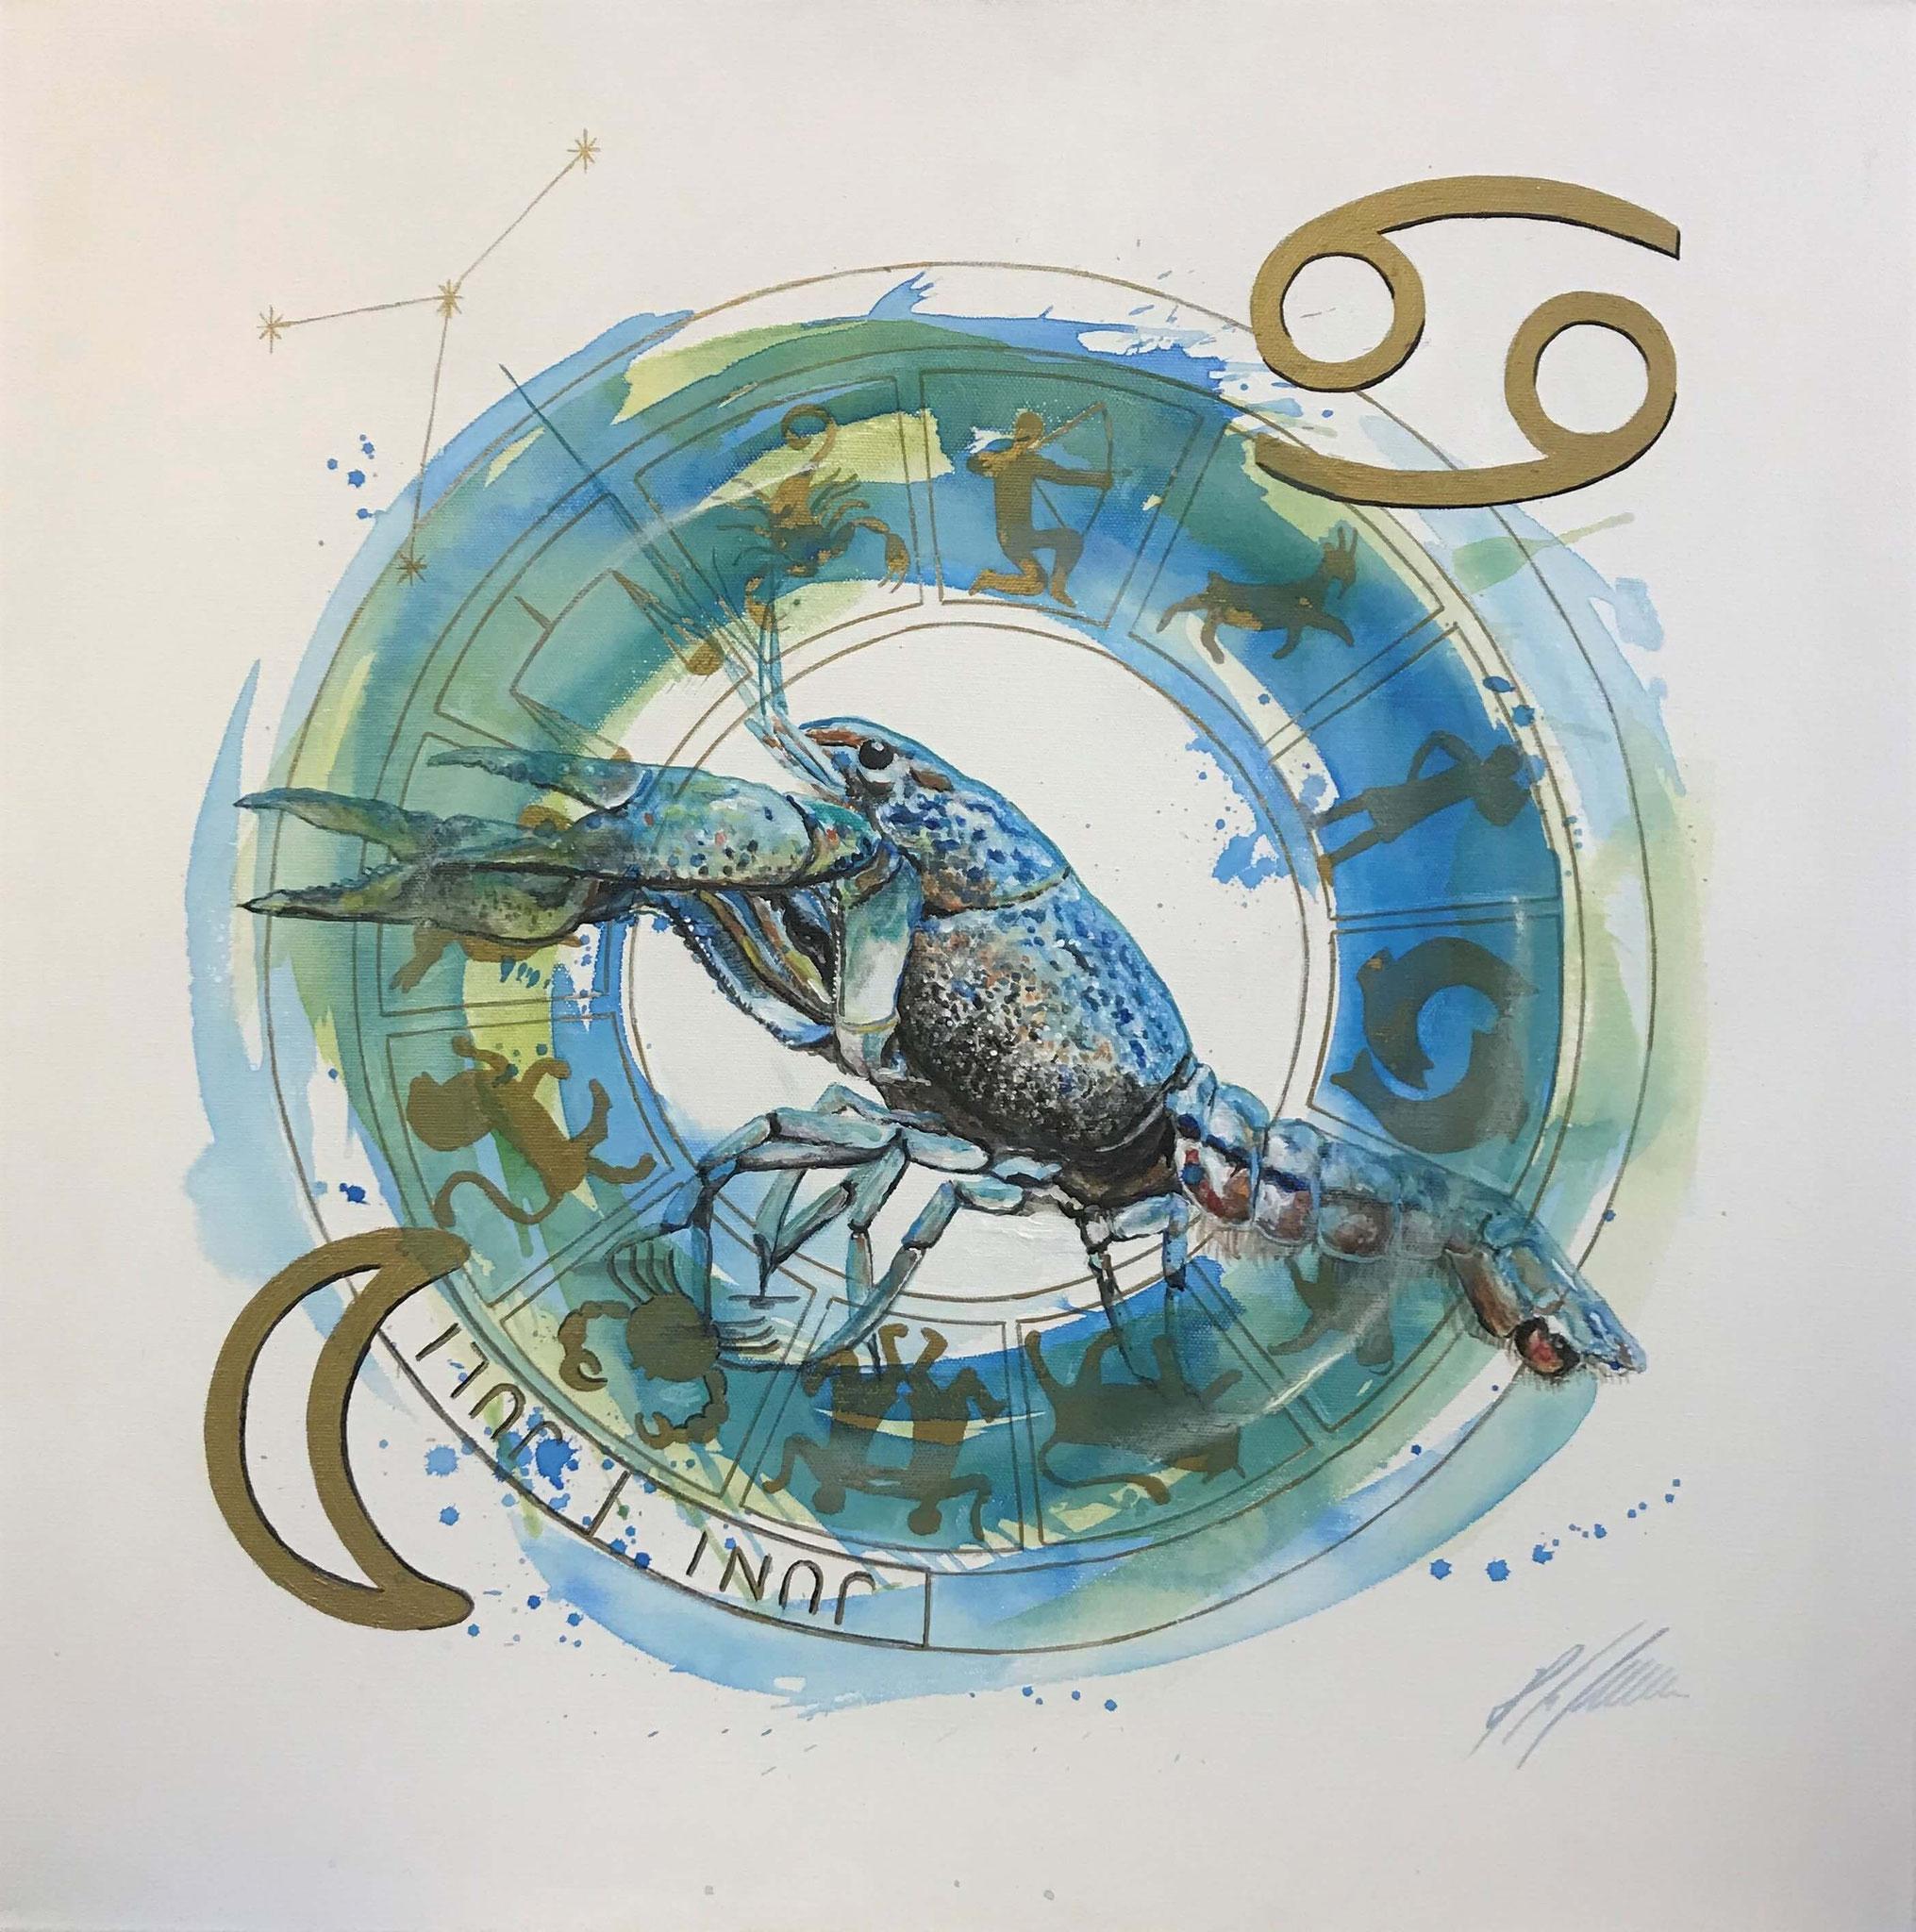 "Fr. 480.00 ""Krebs, Serie modern"" Acryl auf Leinwand mit Rahmen 60 x 60 cm."